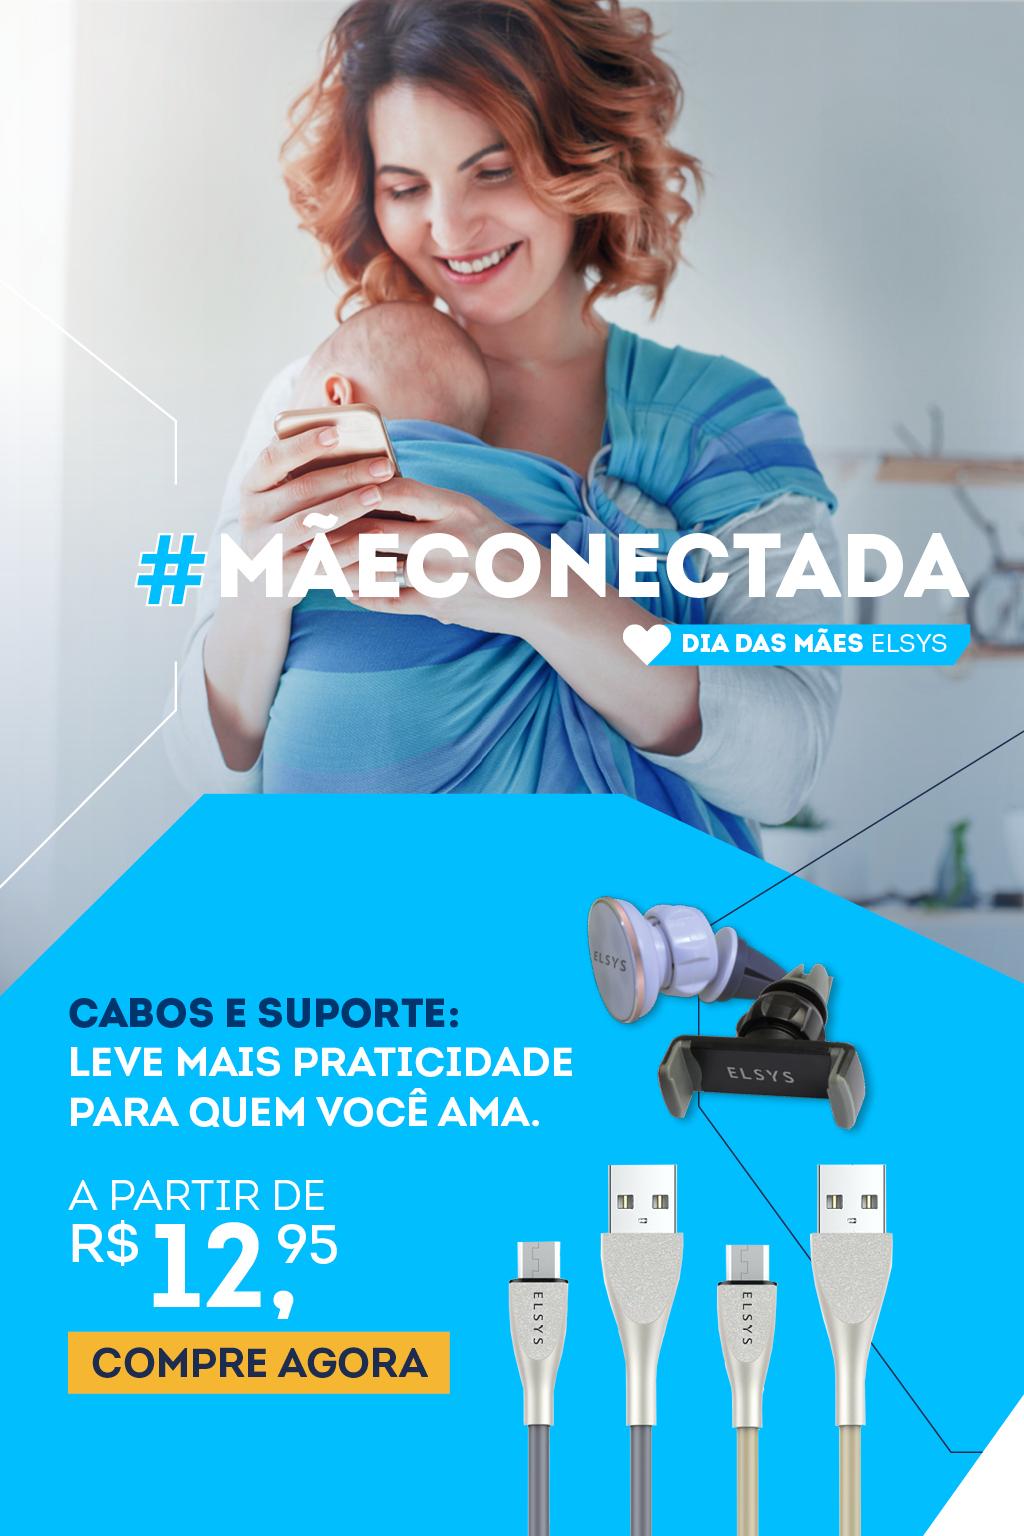 MAES - CABO E SUPORTE